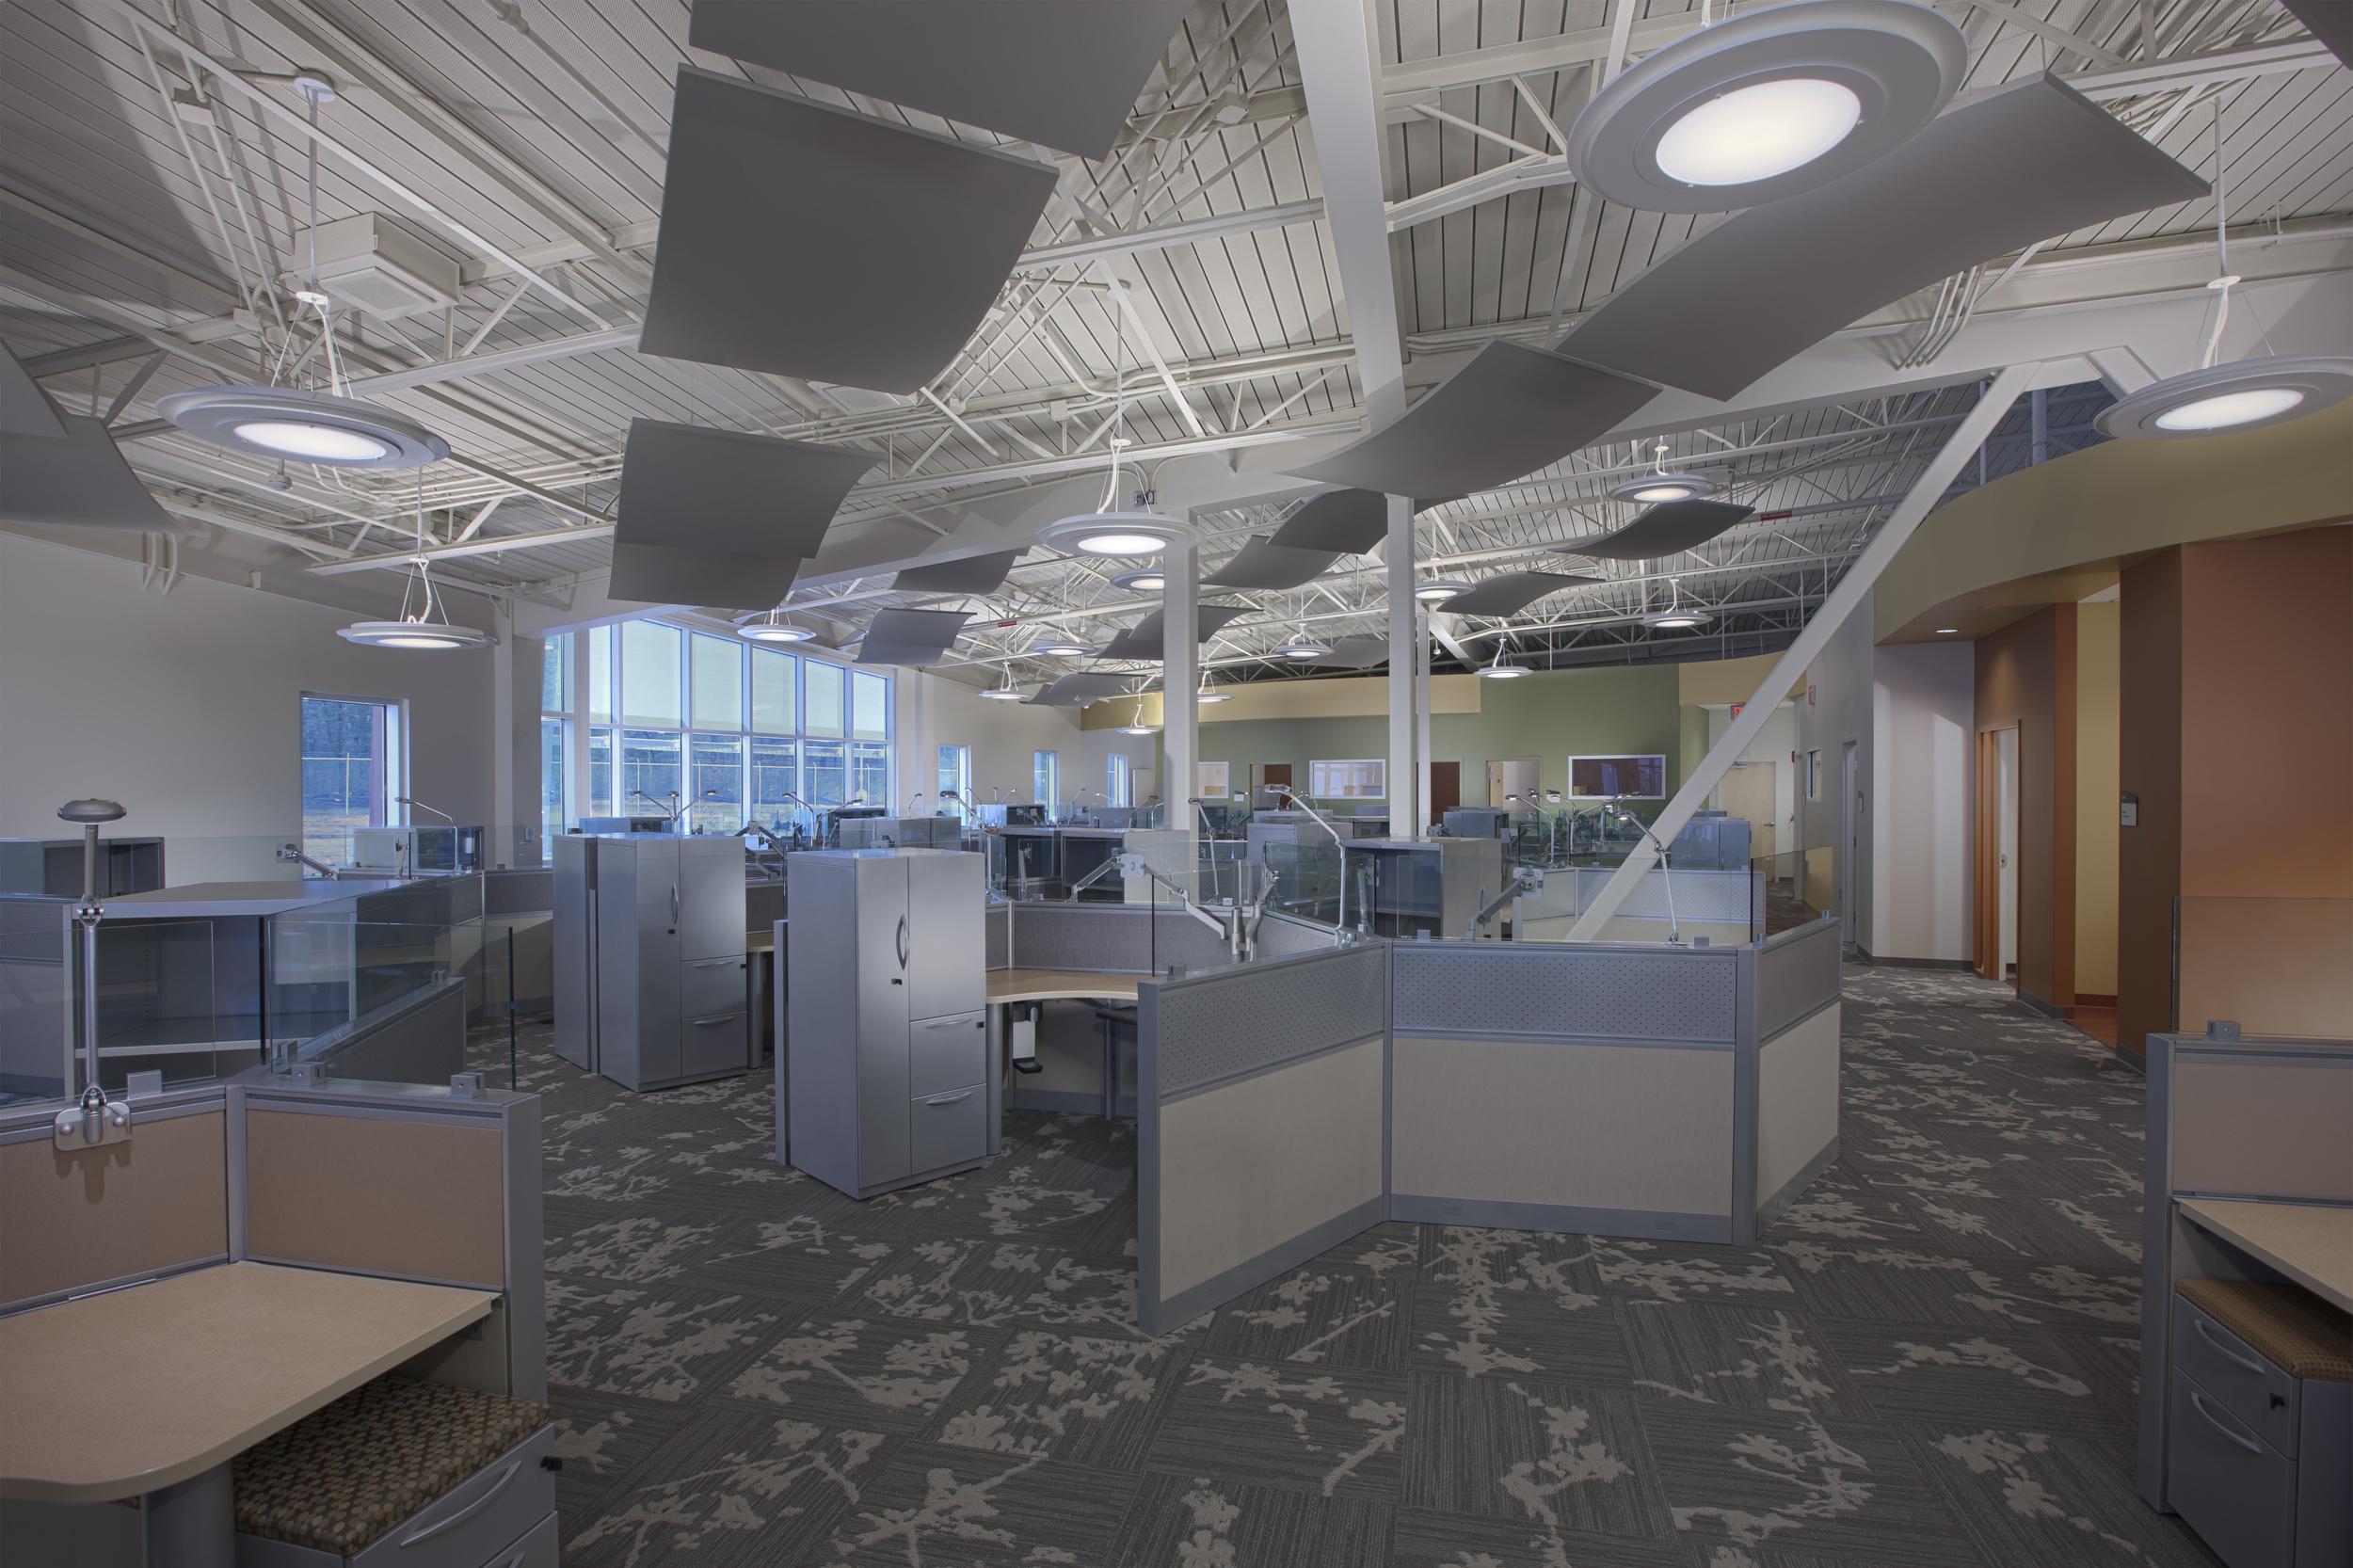 SMECO Office Interior Image-137312.jpg